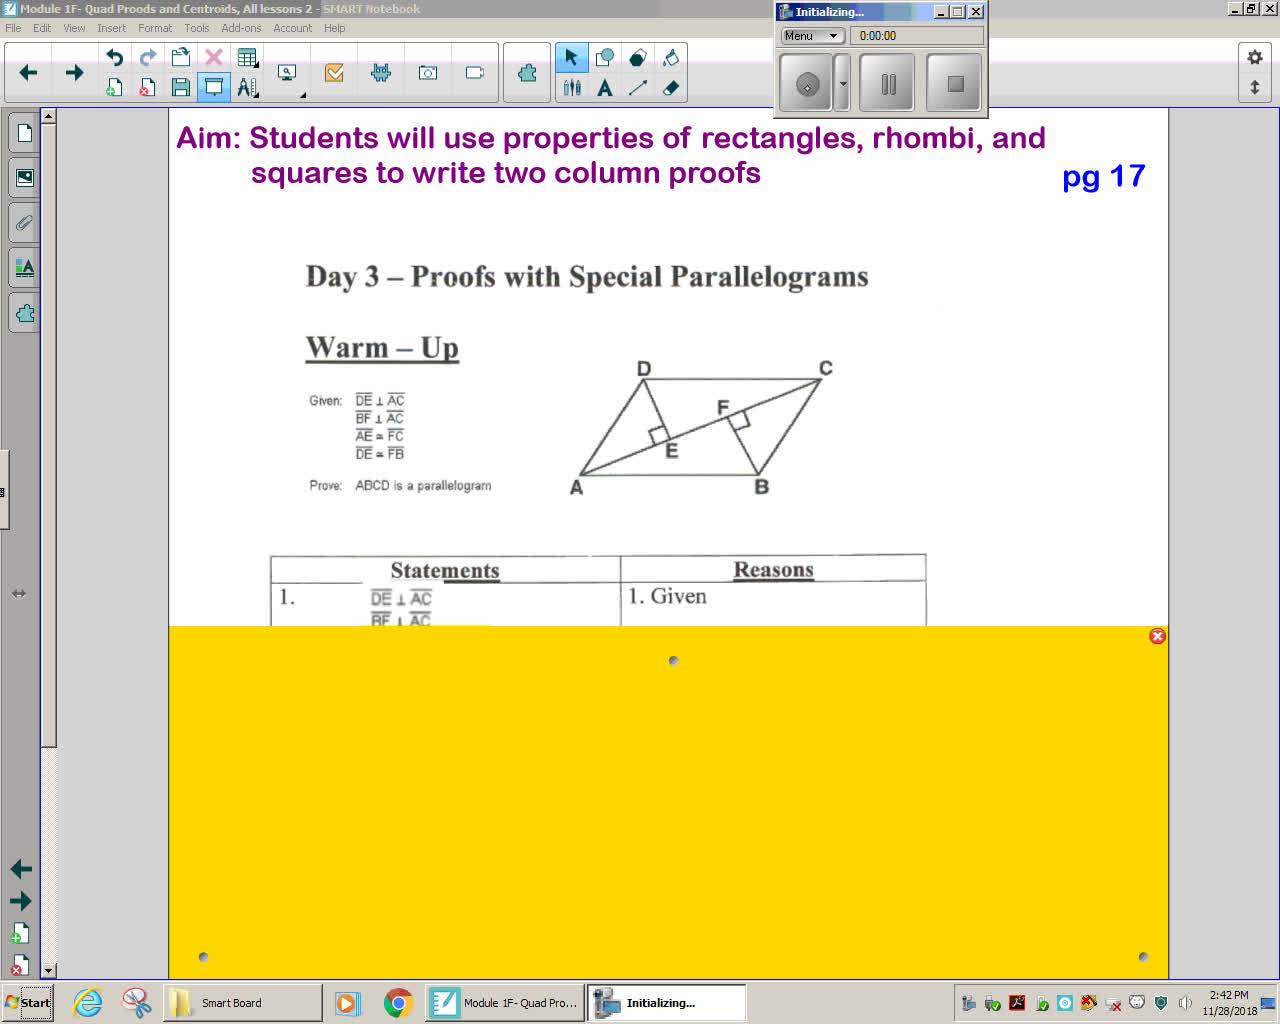 Mod 1F Unit 3B Lesson 3